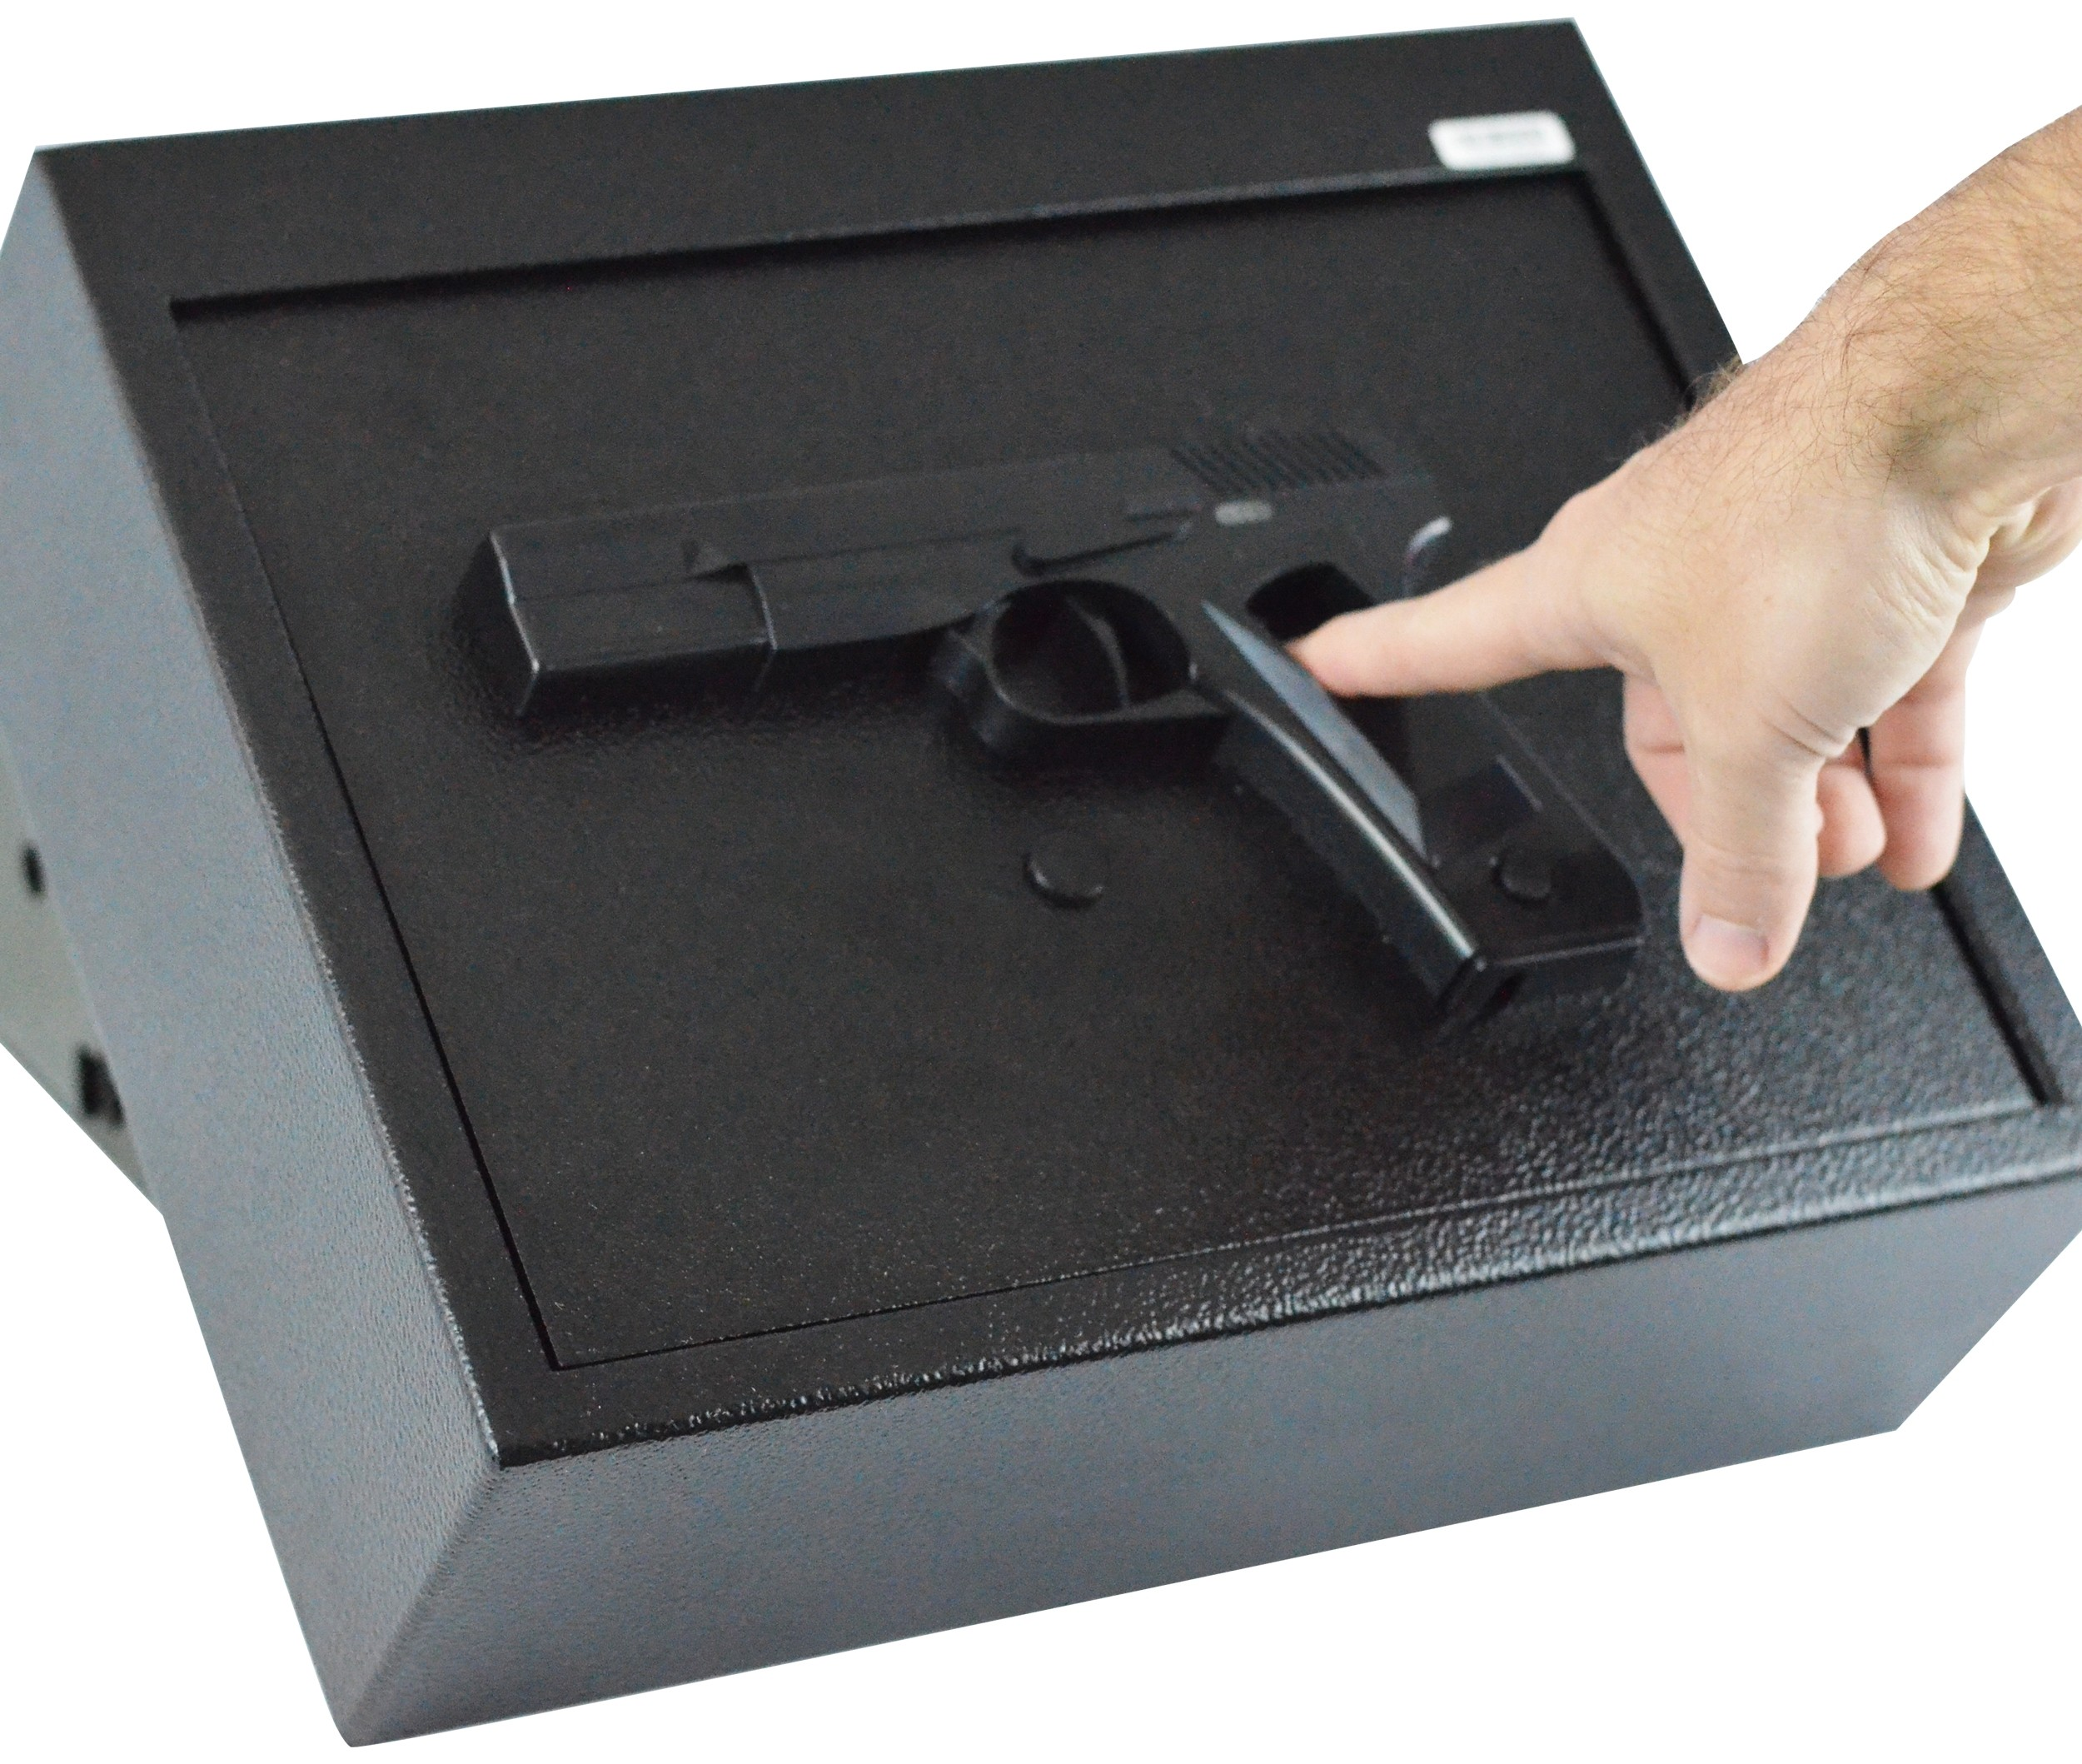 Biometric Fingerprint Drawer Personal Gun Safe, Black